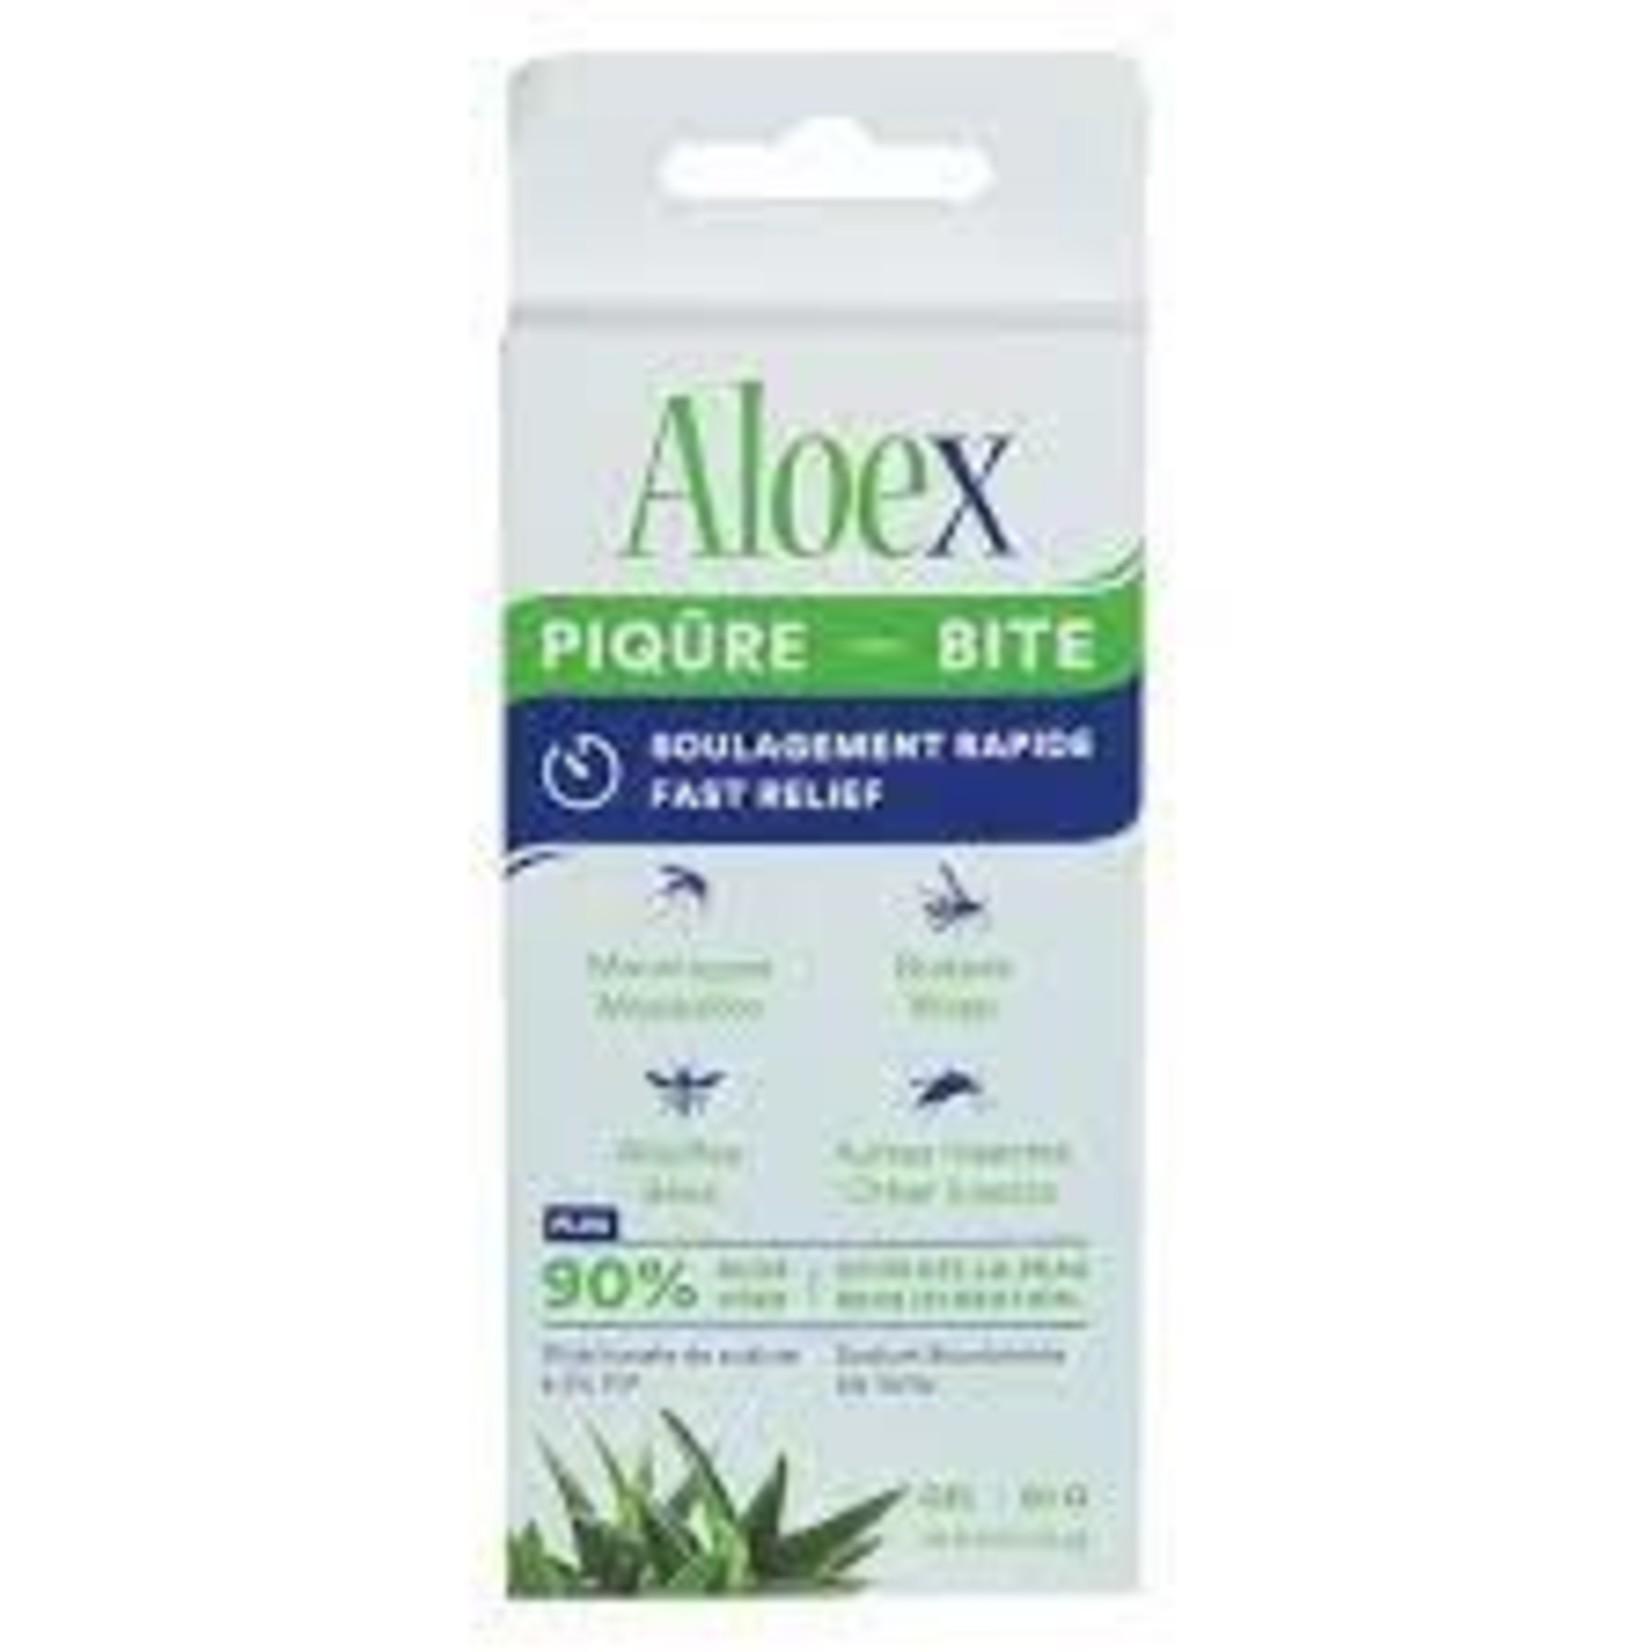 Aloex Bite Fast Relief